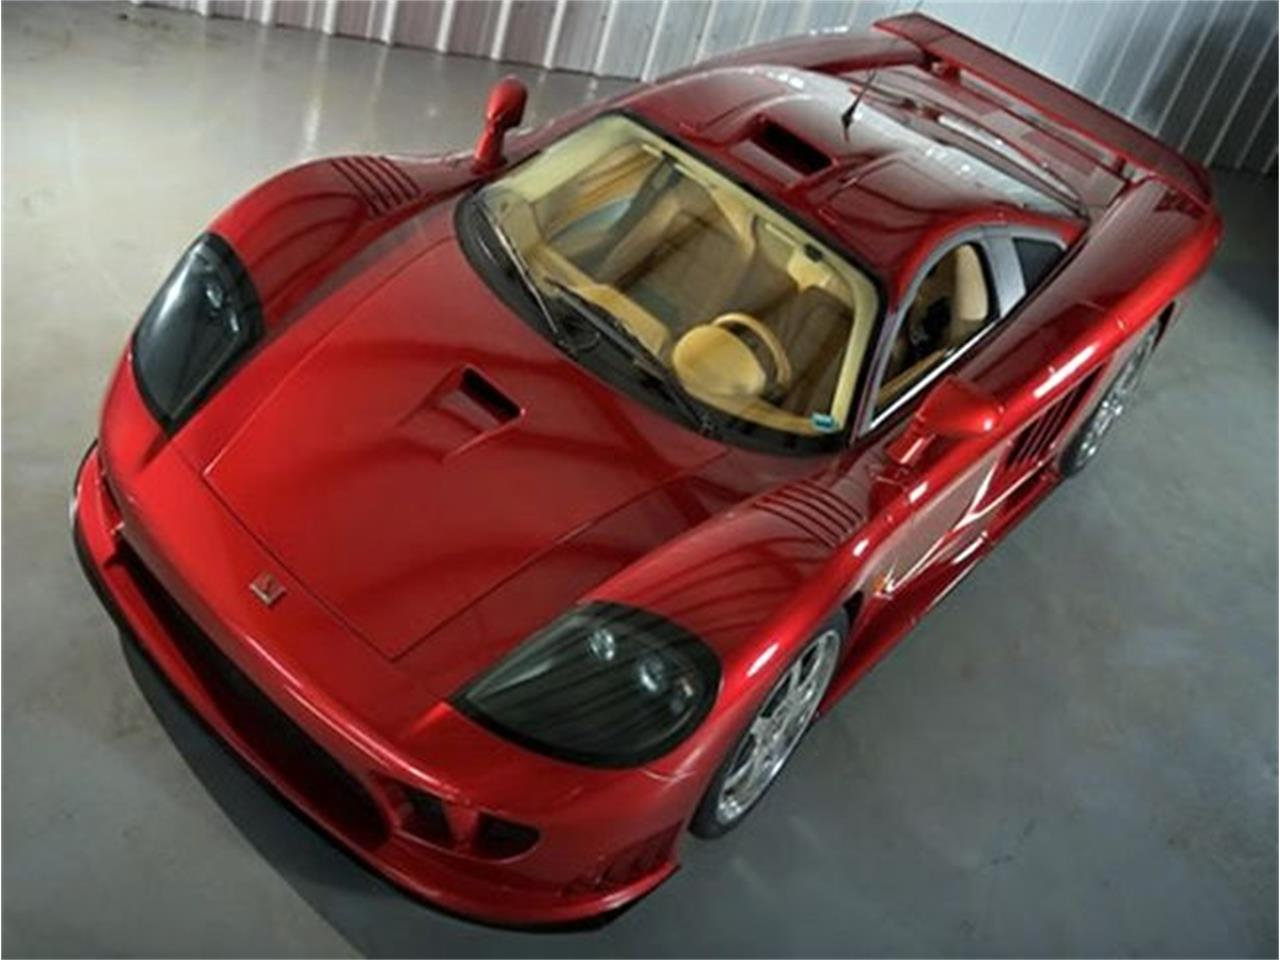 Large Picture of 2003 S7 located in Alpharetta Georgia - $325,000.00 - DMIJ